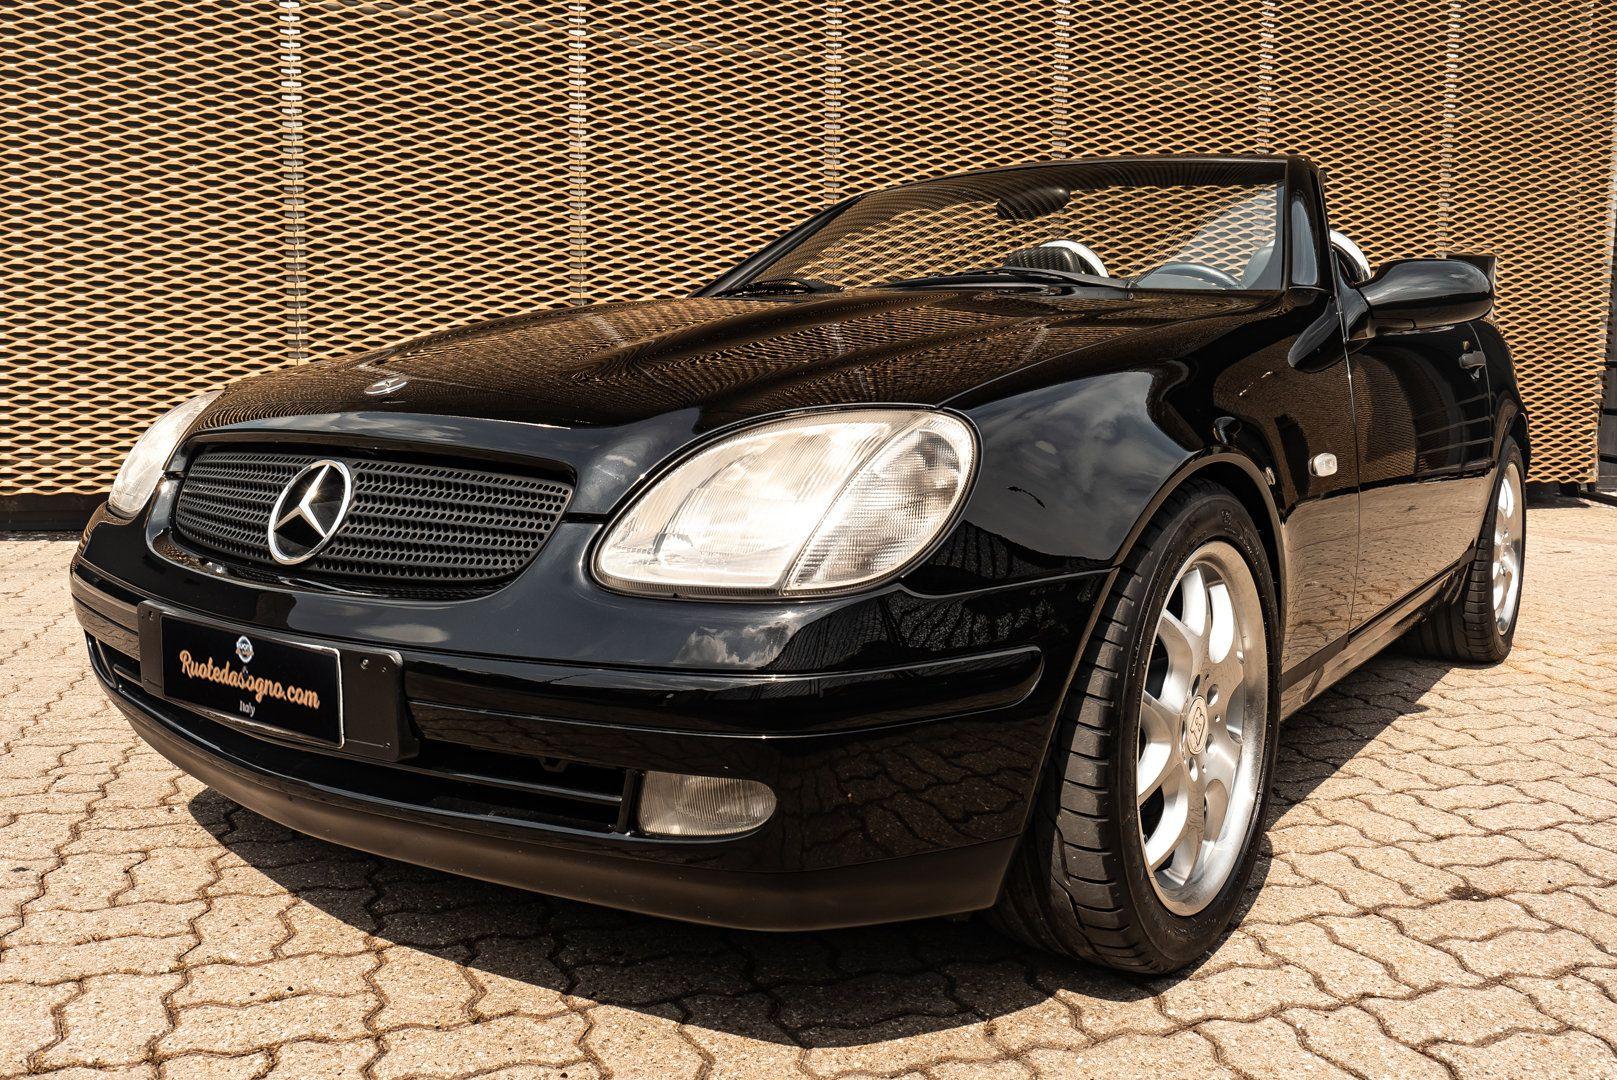 1998 Mercedes-Benz SLK 230 Brabus K1 73738